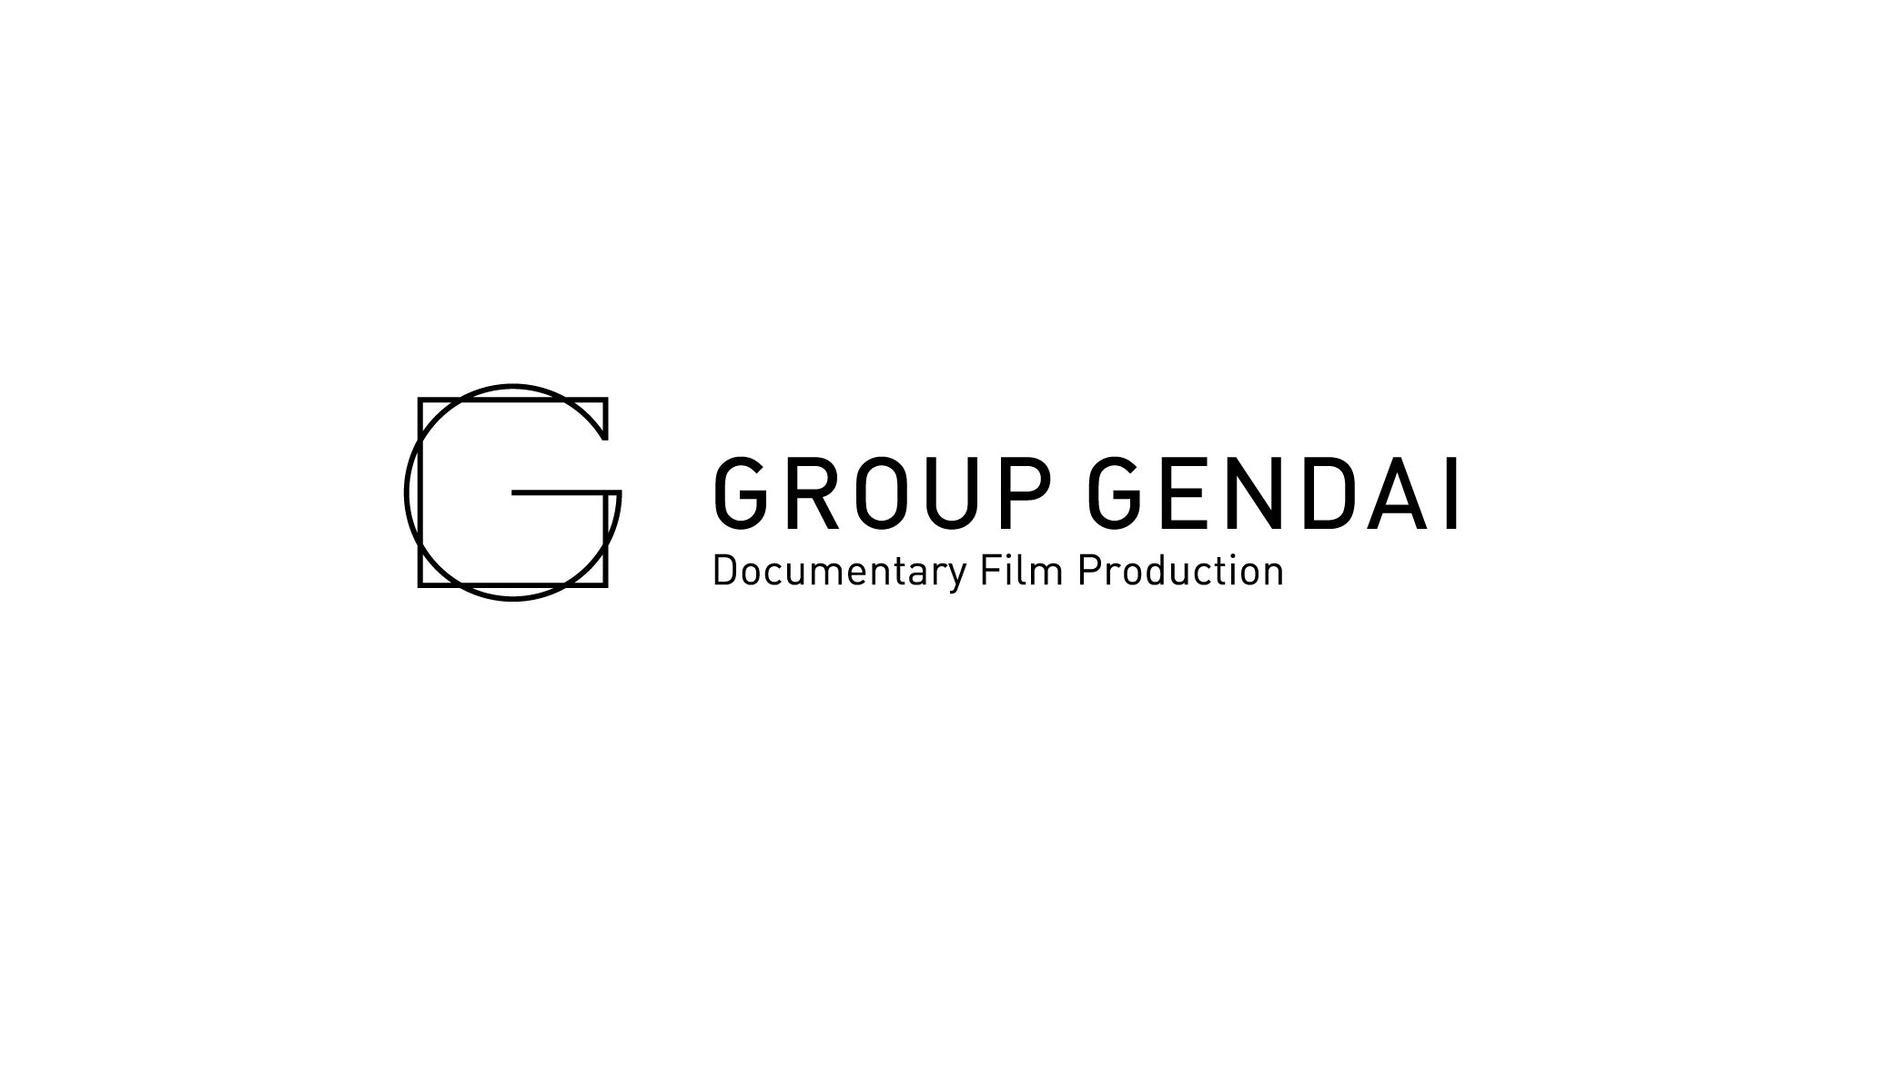 GROUP GENDAI